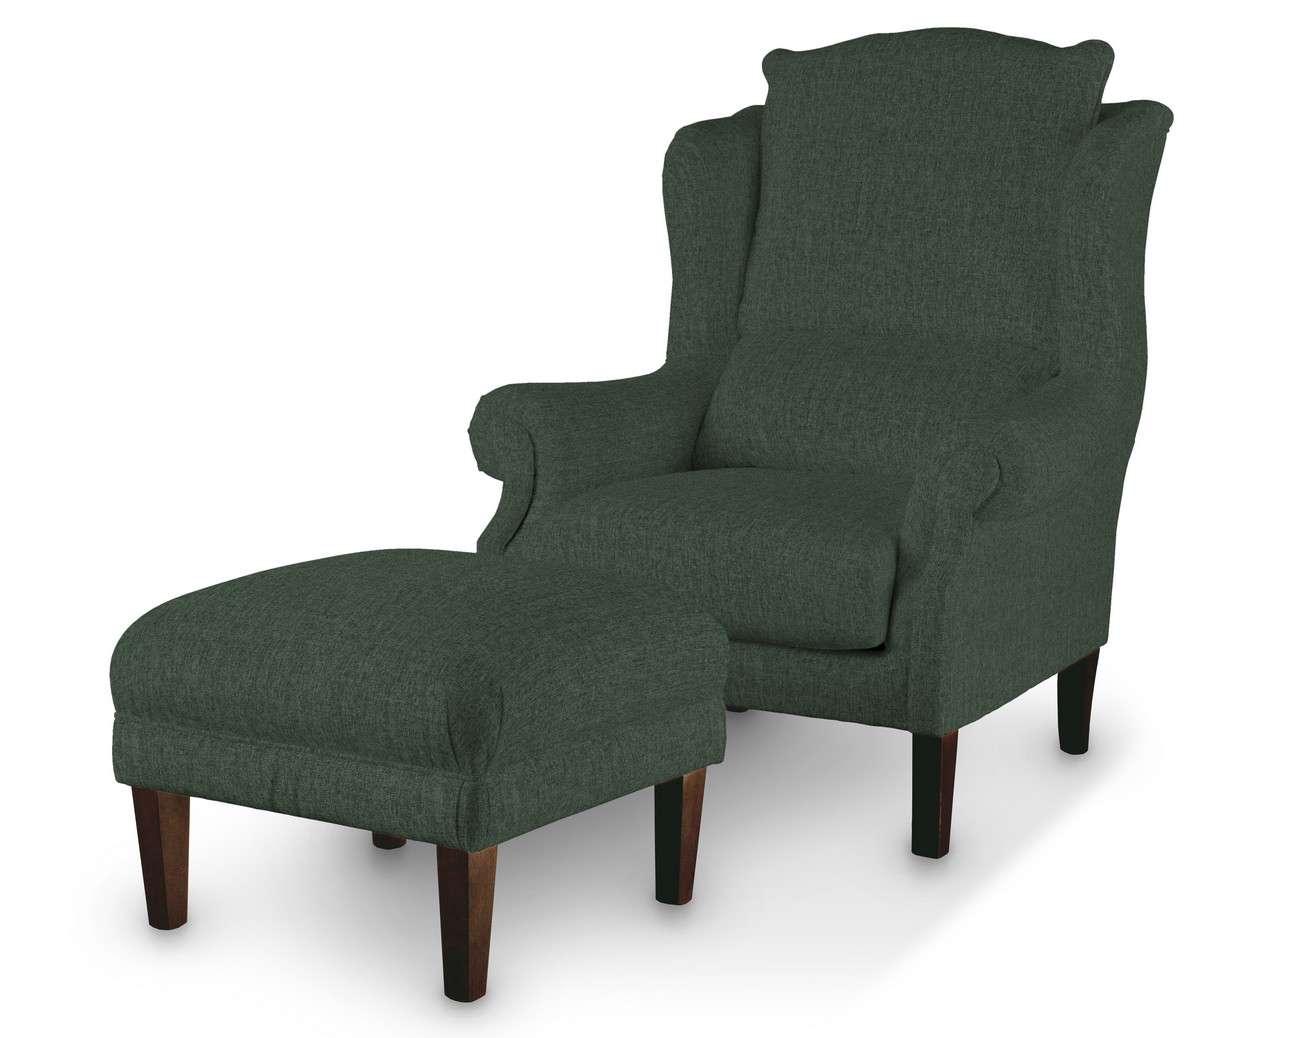 Podnóżek do fotela w kolekcji City, tkanina: 704-81